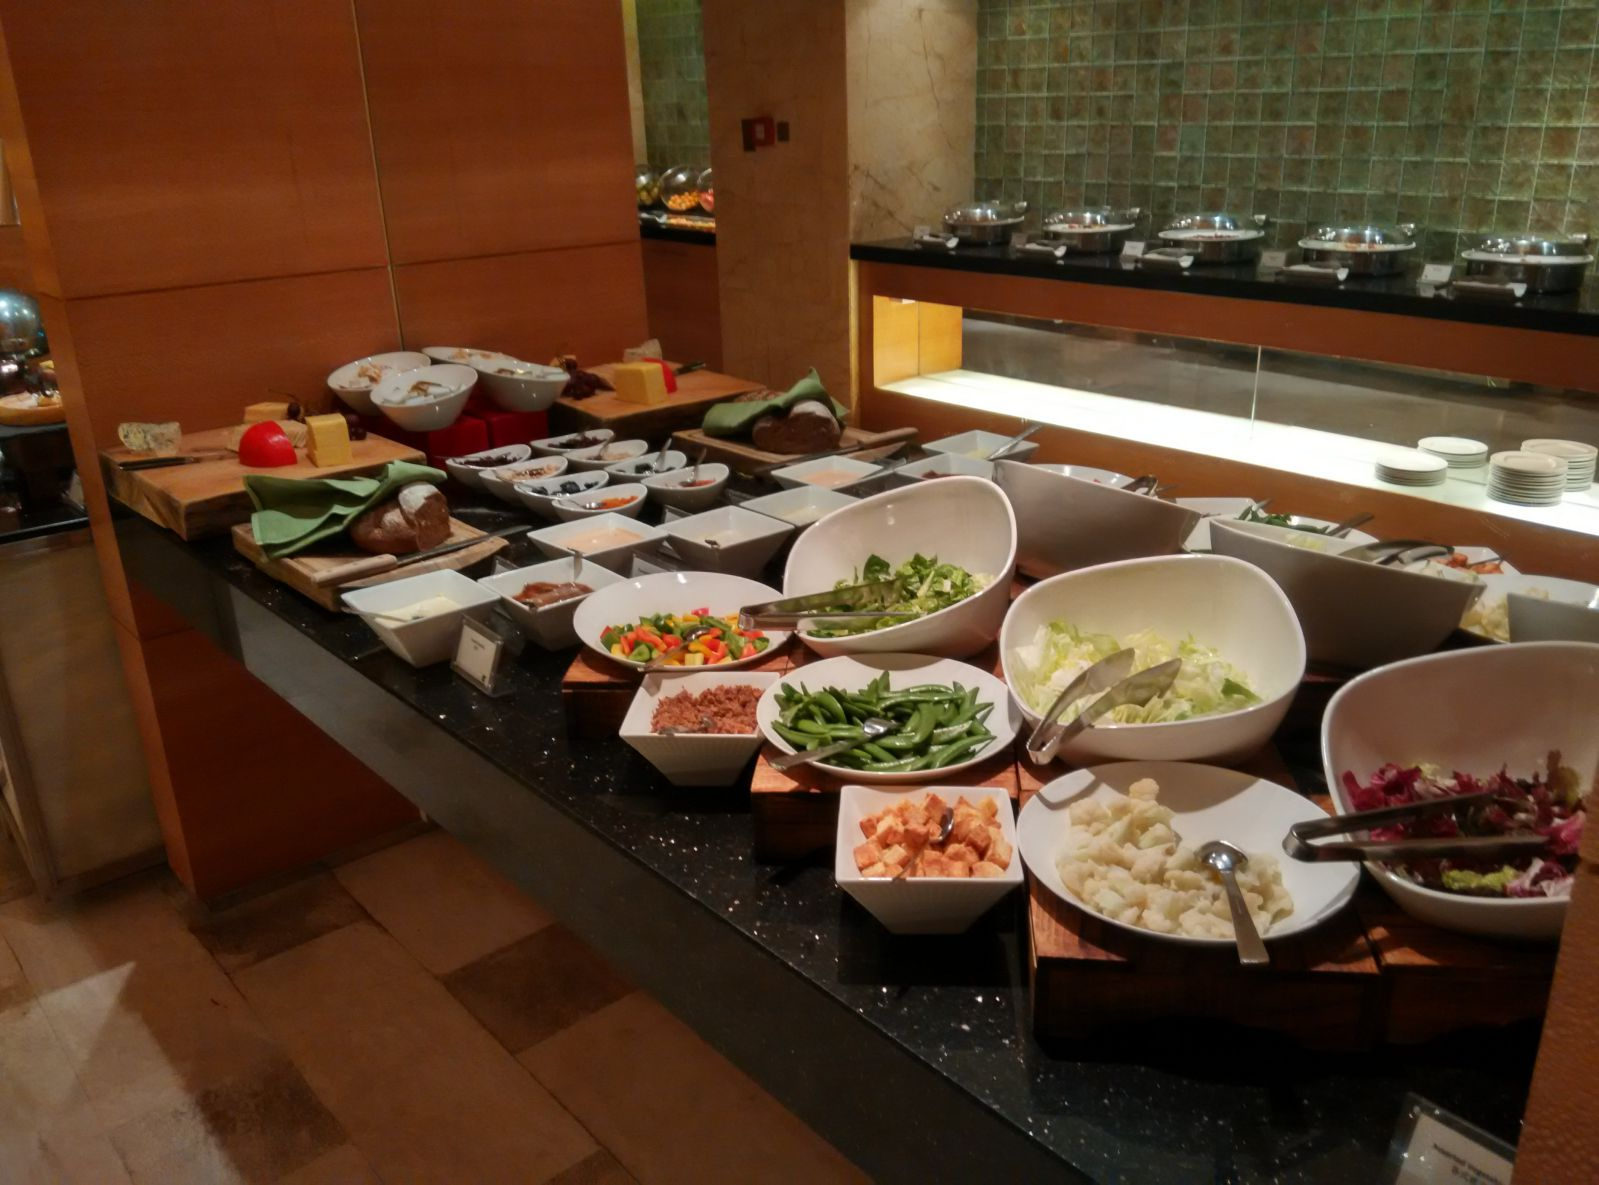 shenzhen-jw-marriott-executive-lounge-salad